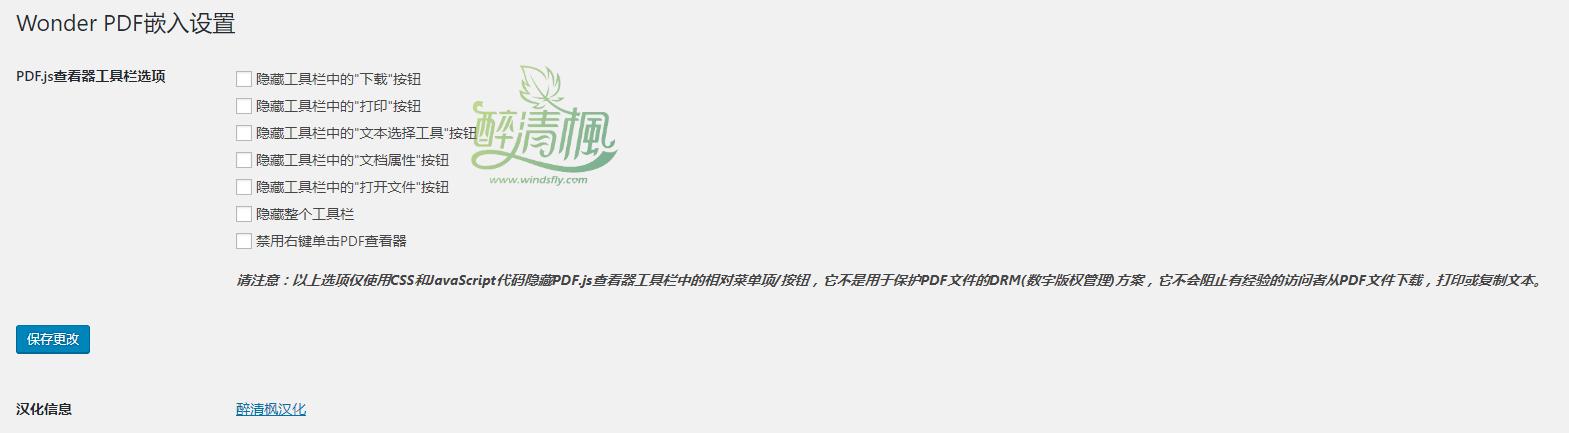 WordPress PDF嵌入插件 - Wonder PDF Embed v1.6(汉化) WordPress插件 第2张